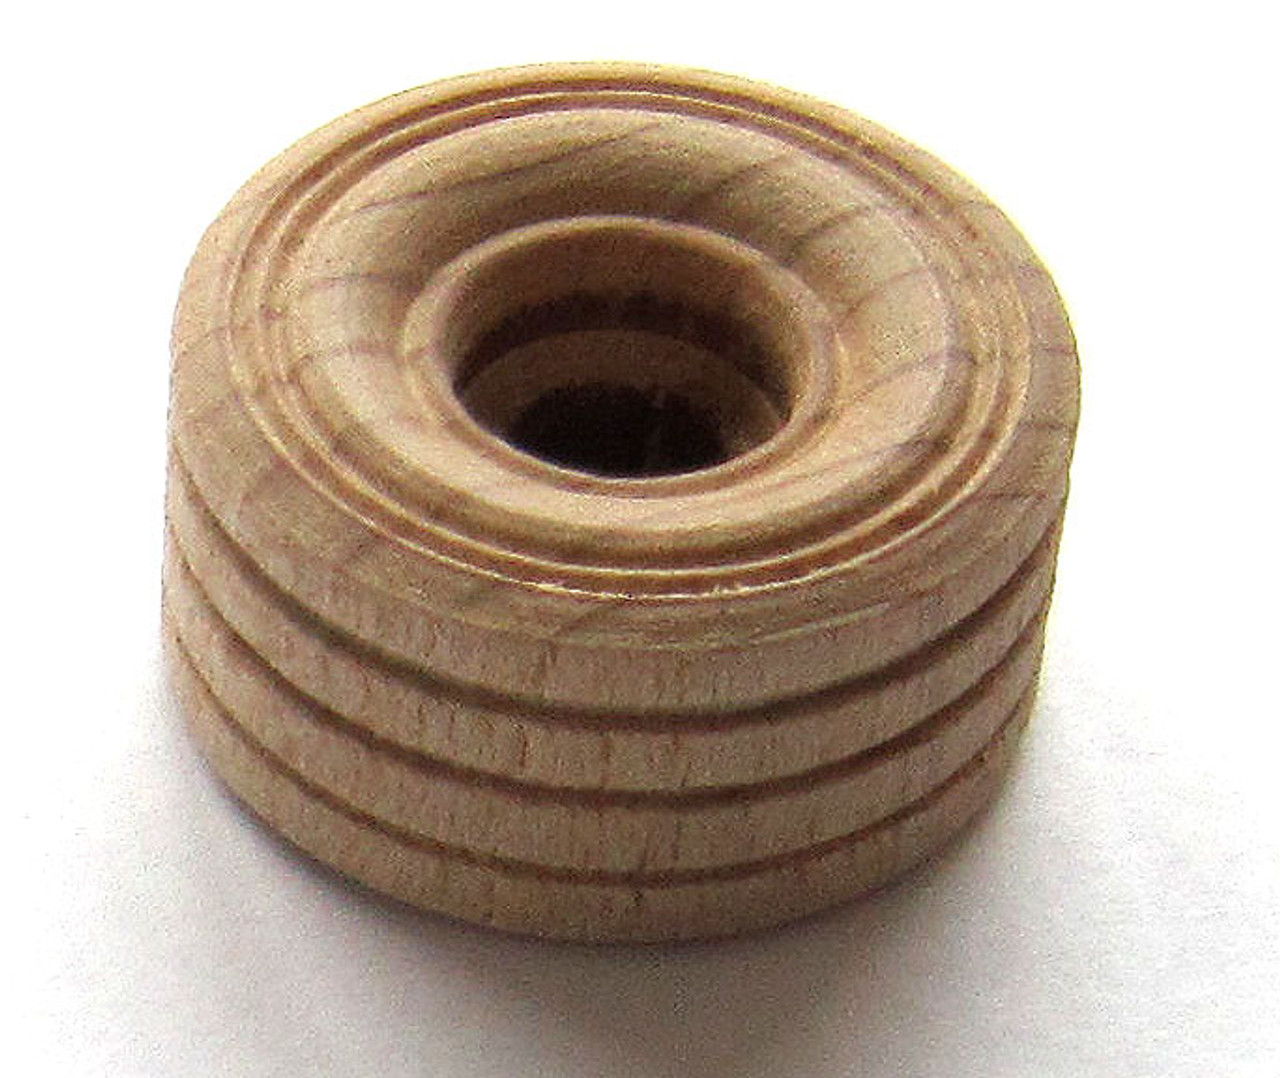 1 Inch Treaded Toy Wheels